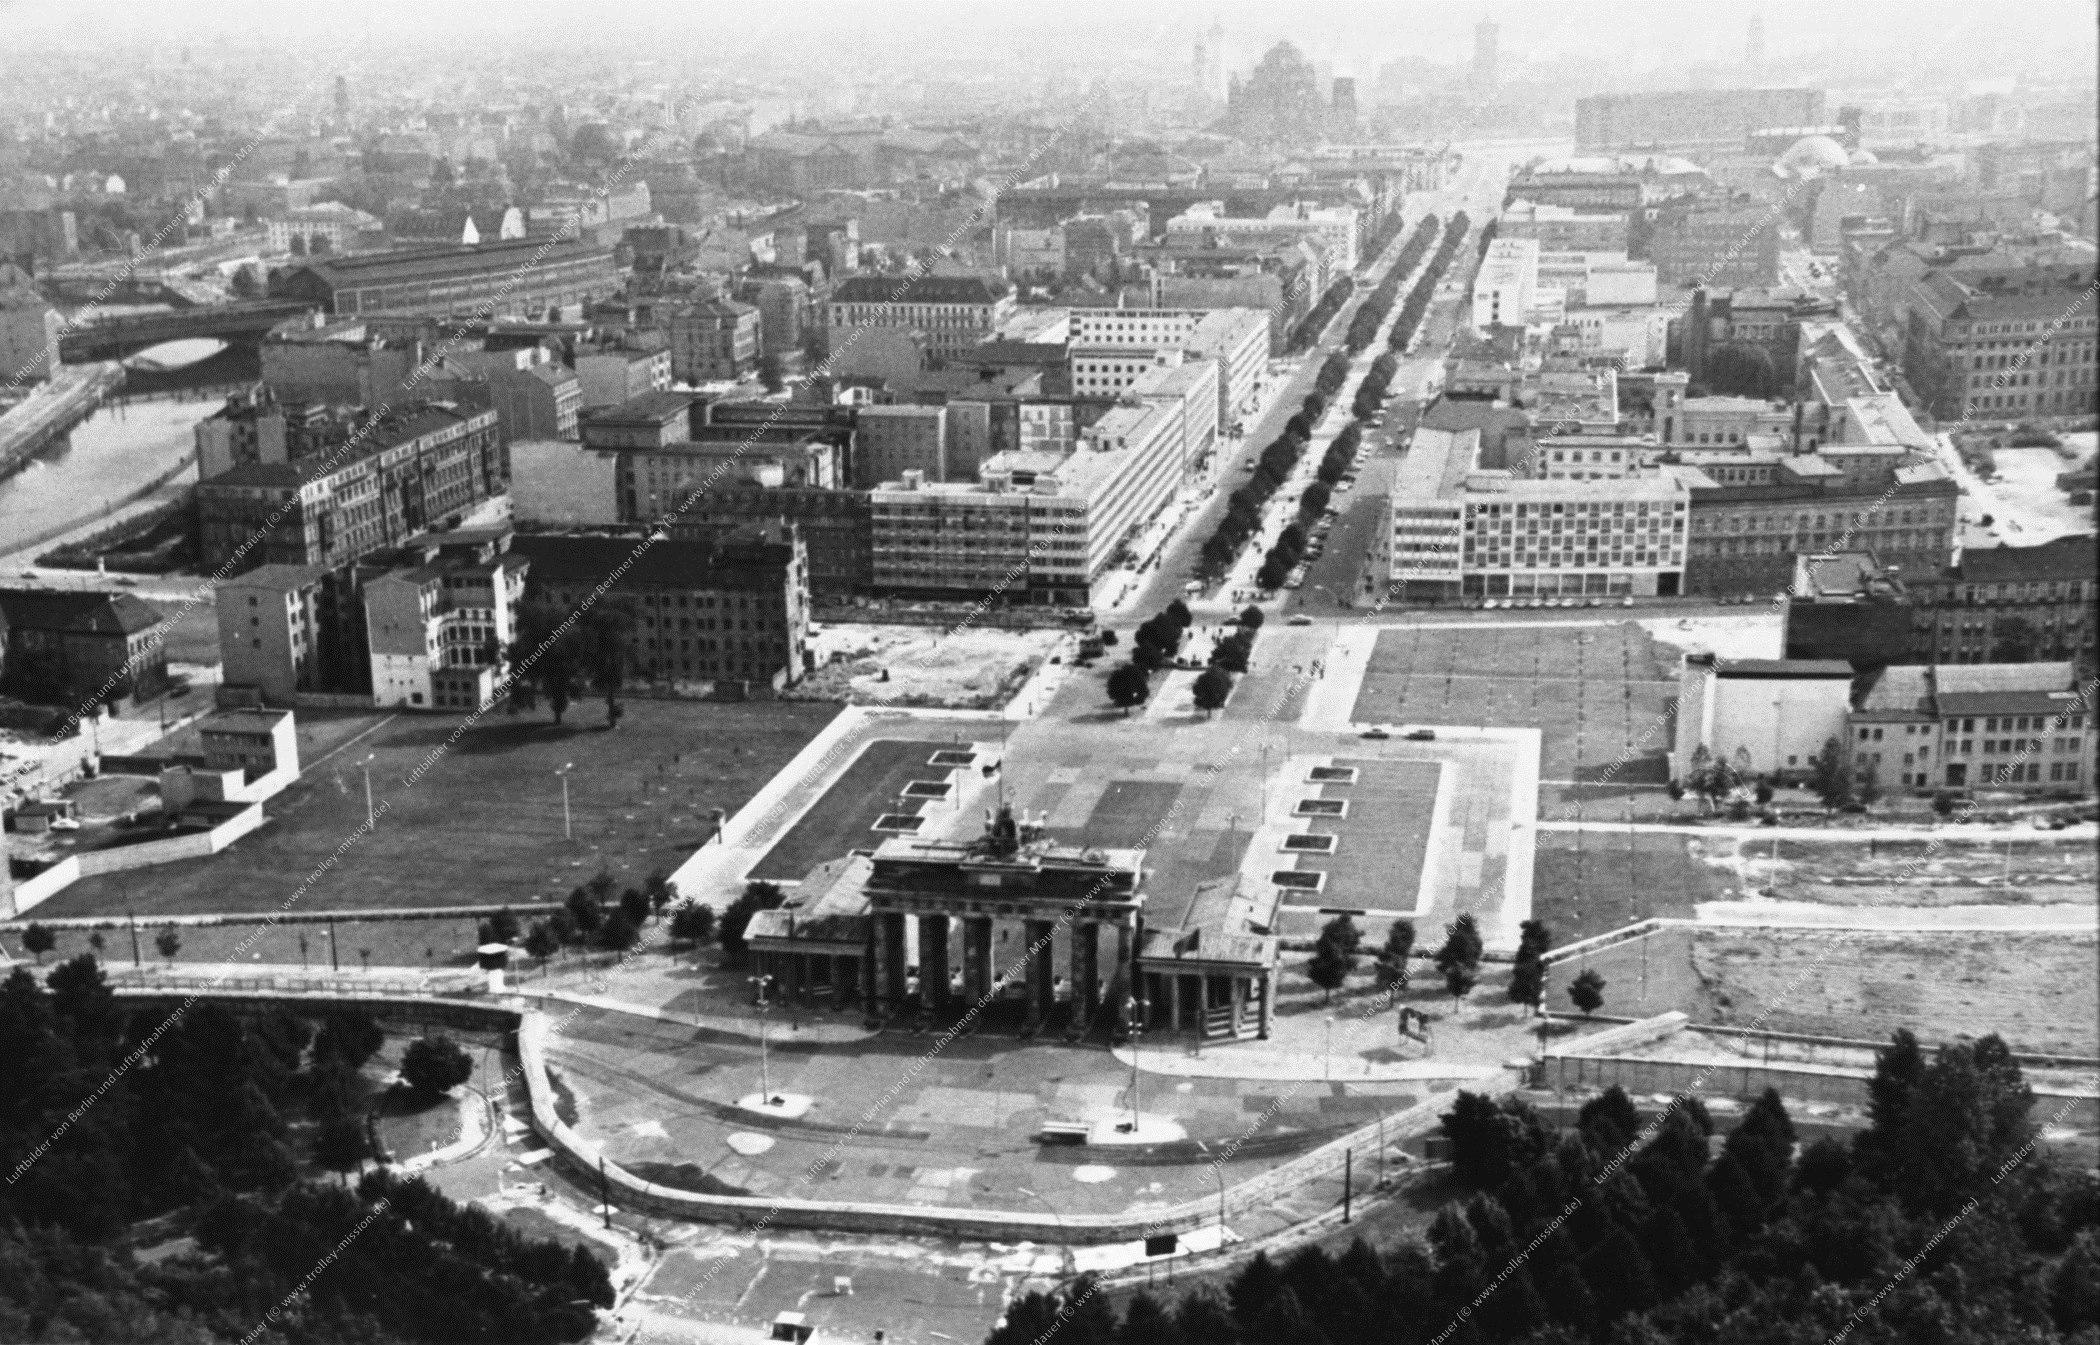 Berlin Luftbild Brandenburger Tor (Bild 014)